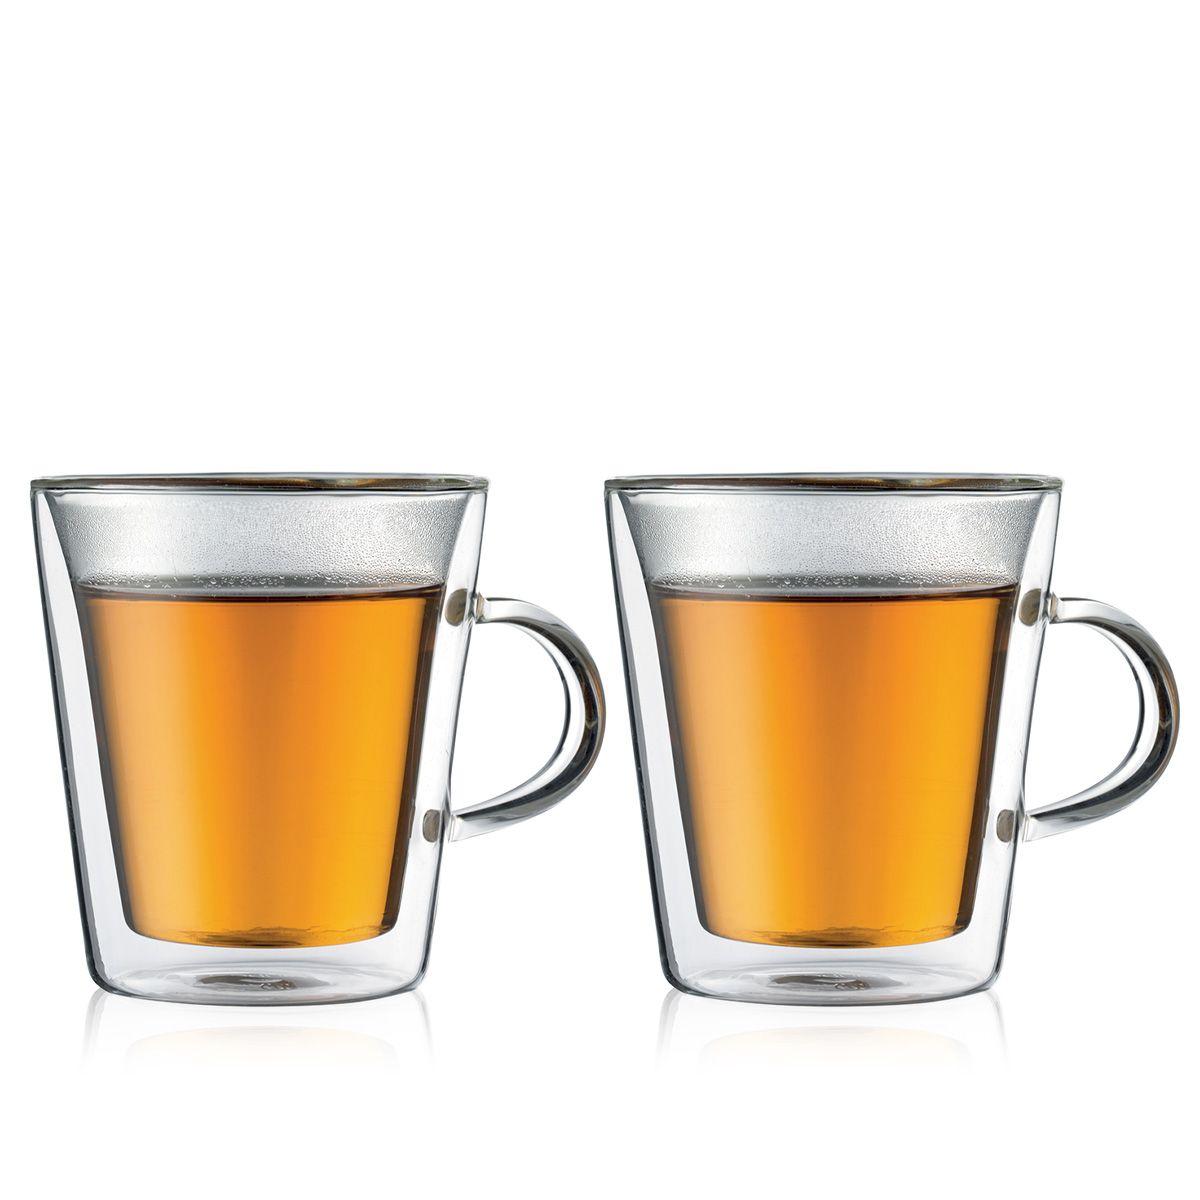 double wall glass mug Bodum